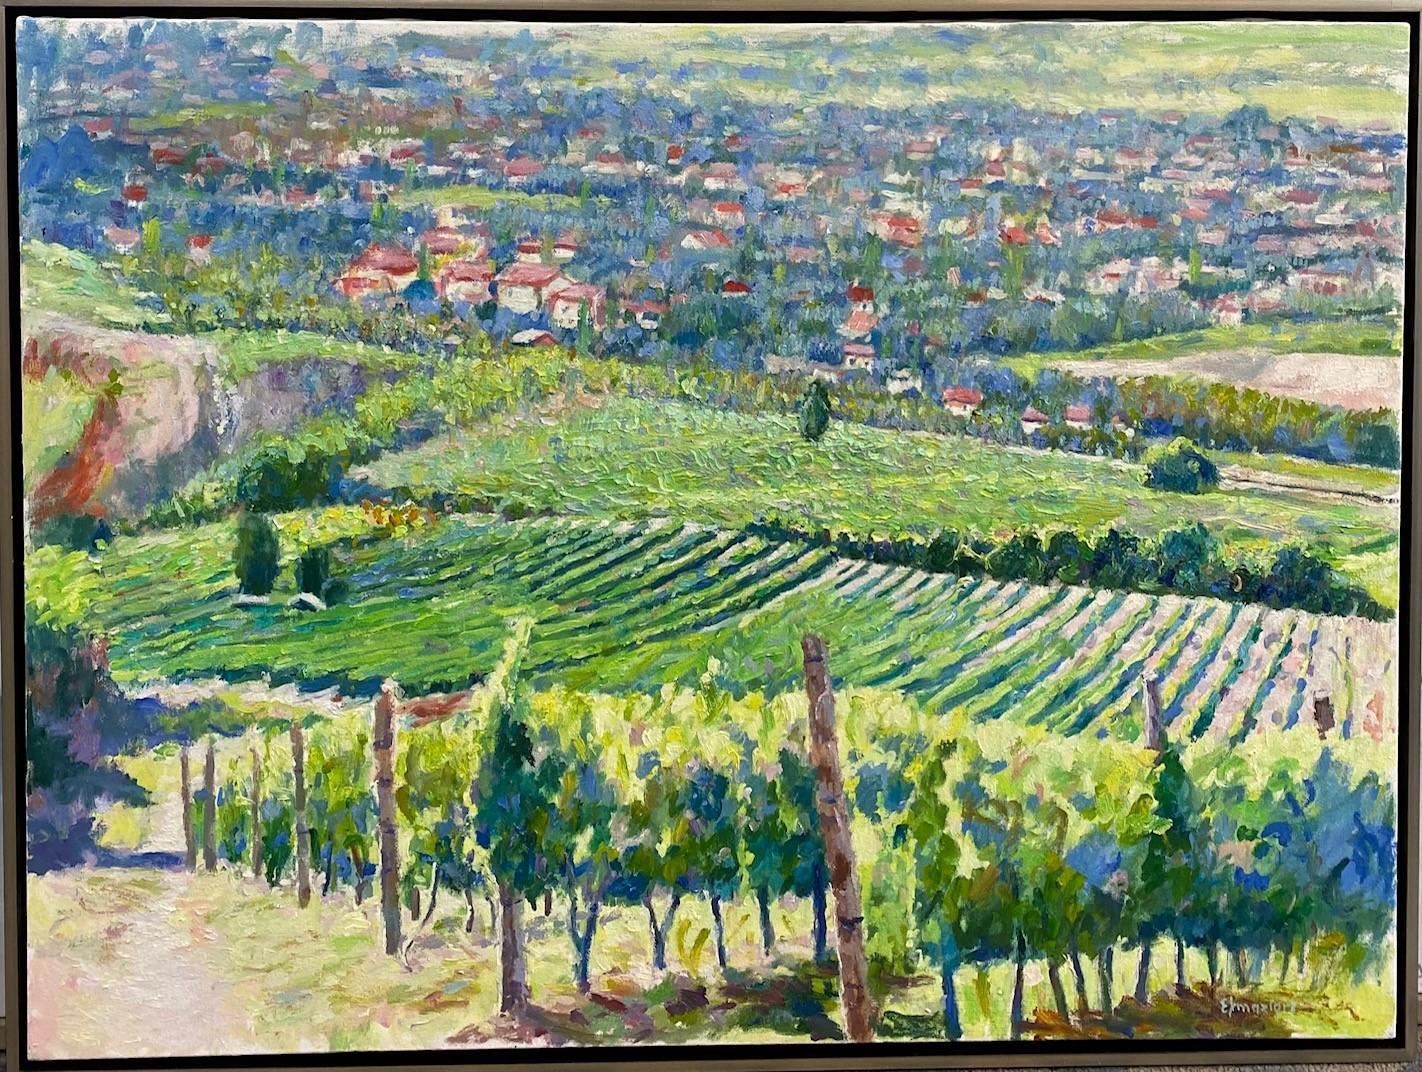 The Vineyards of Sonoma, California 24x36 original impressionist landscape